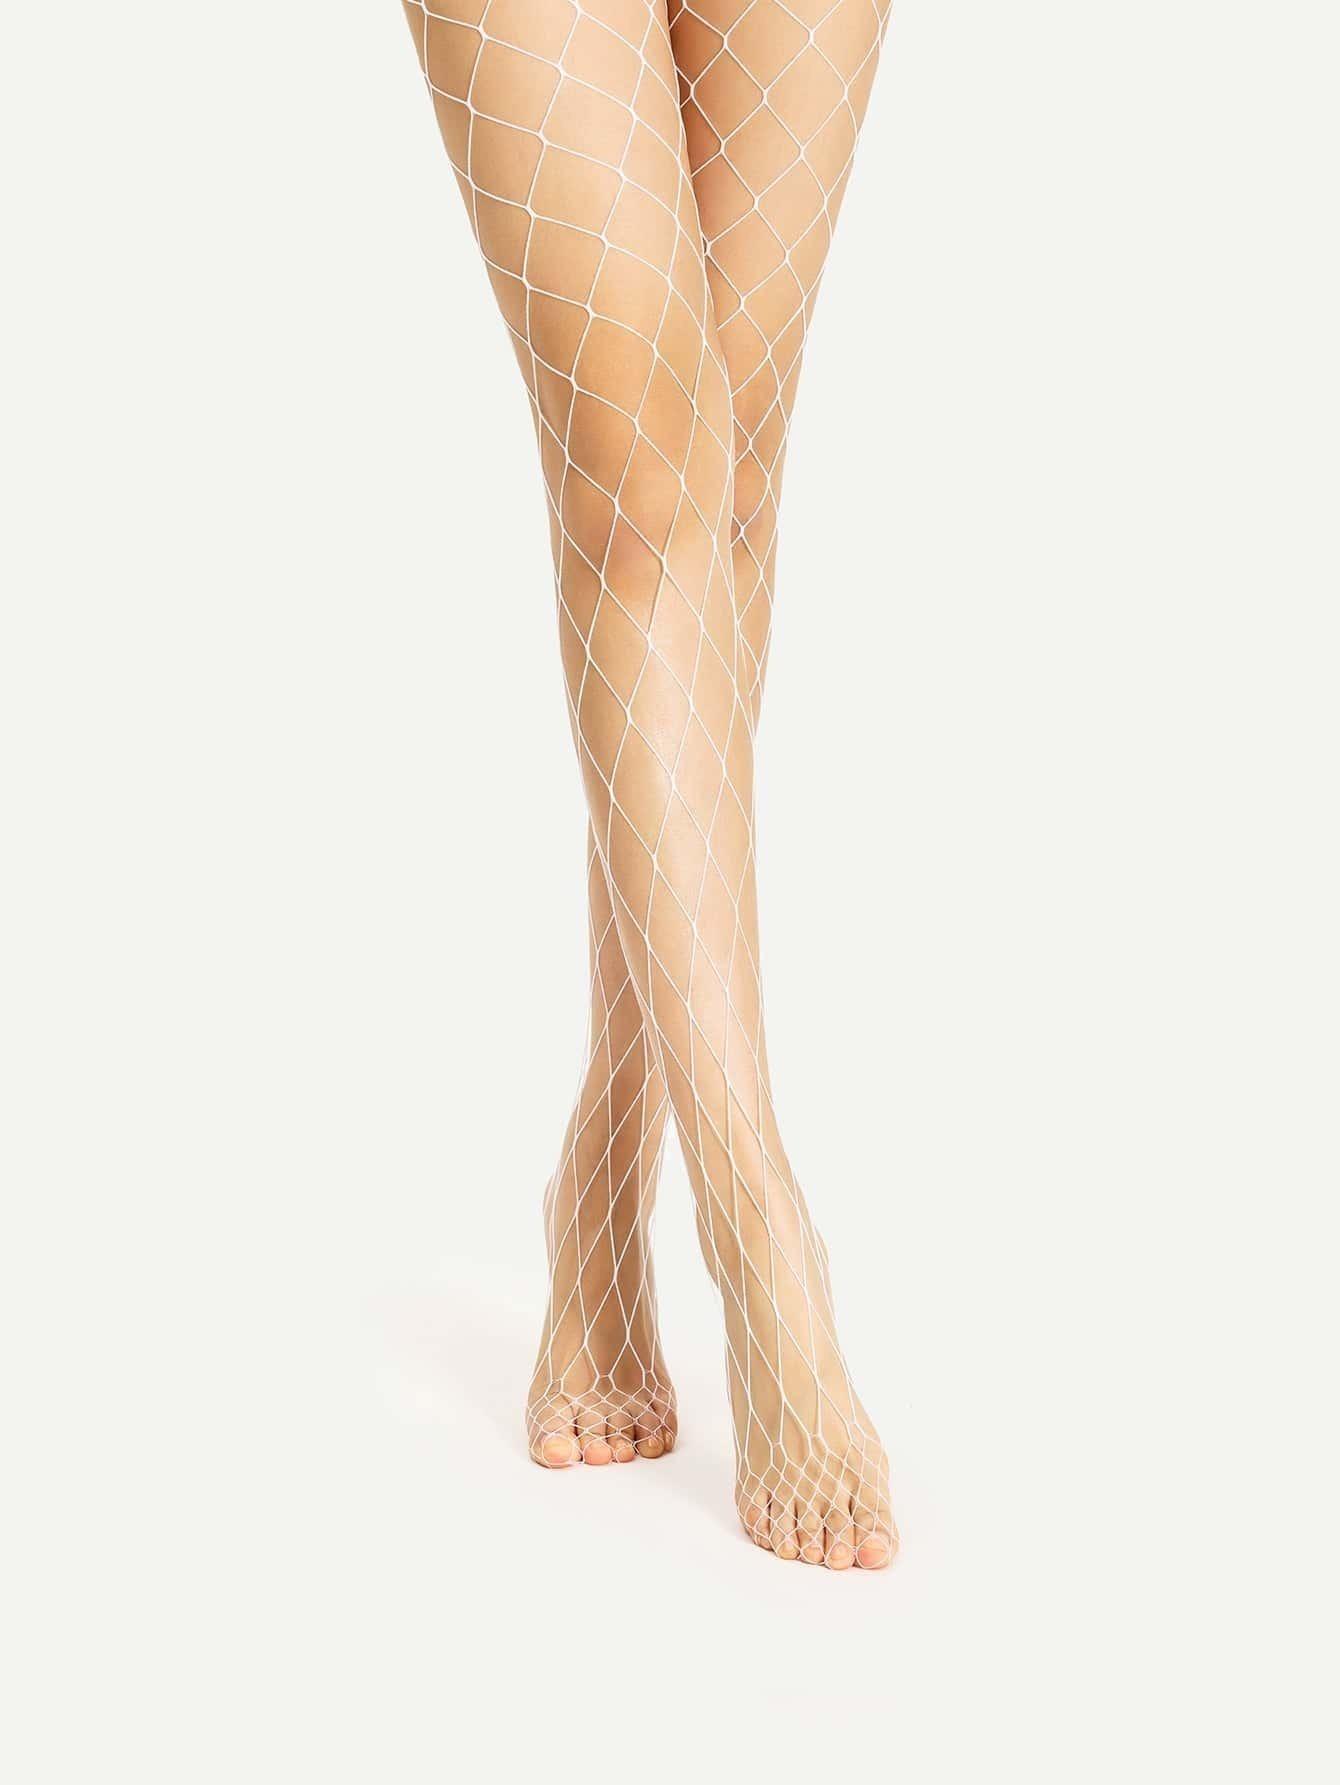 sock170404301_2